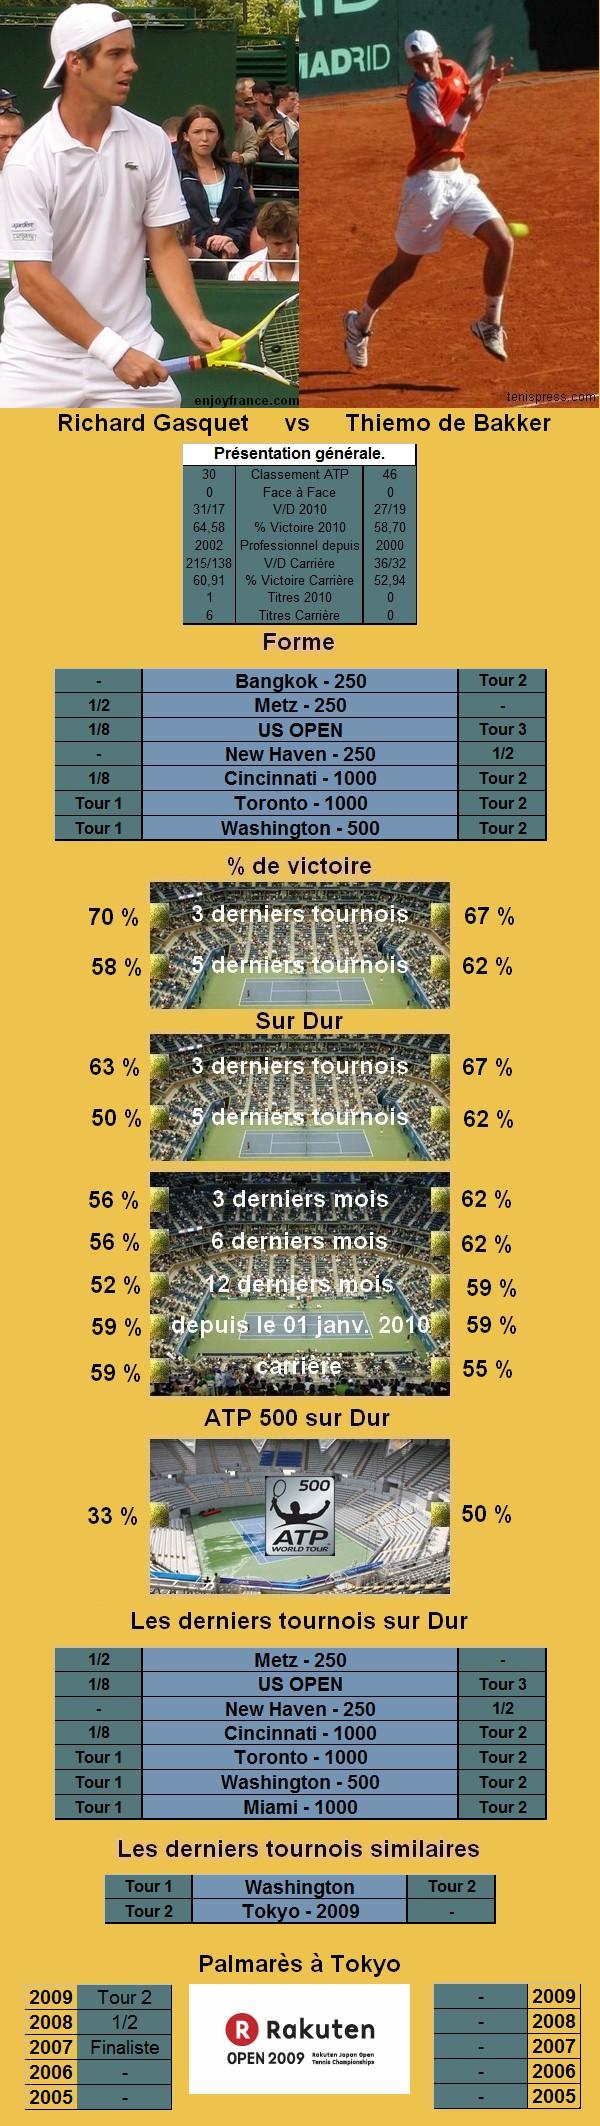 Statistiques tennis de Gasquet contre de Bakker à Tokyo